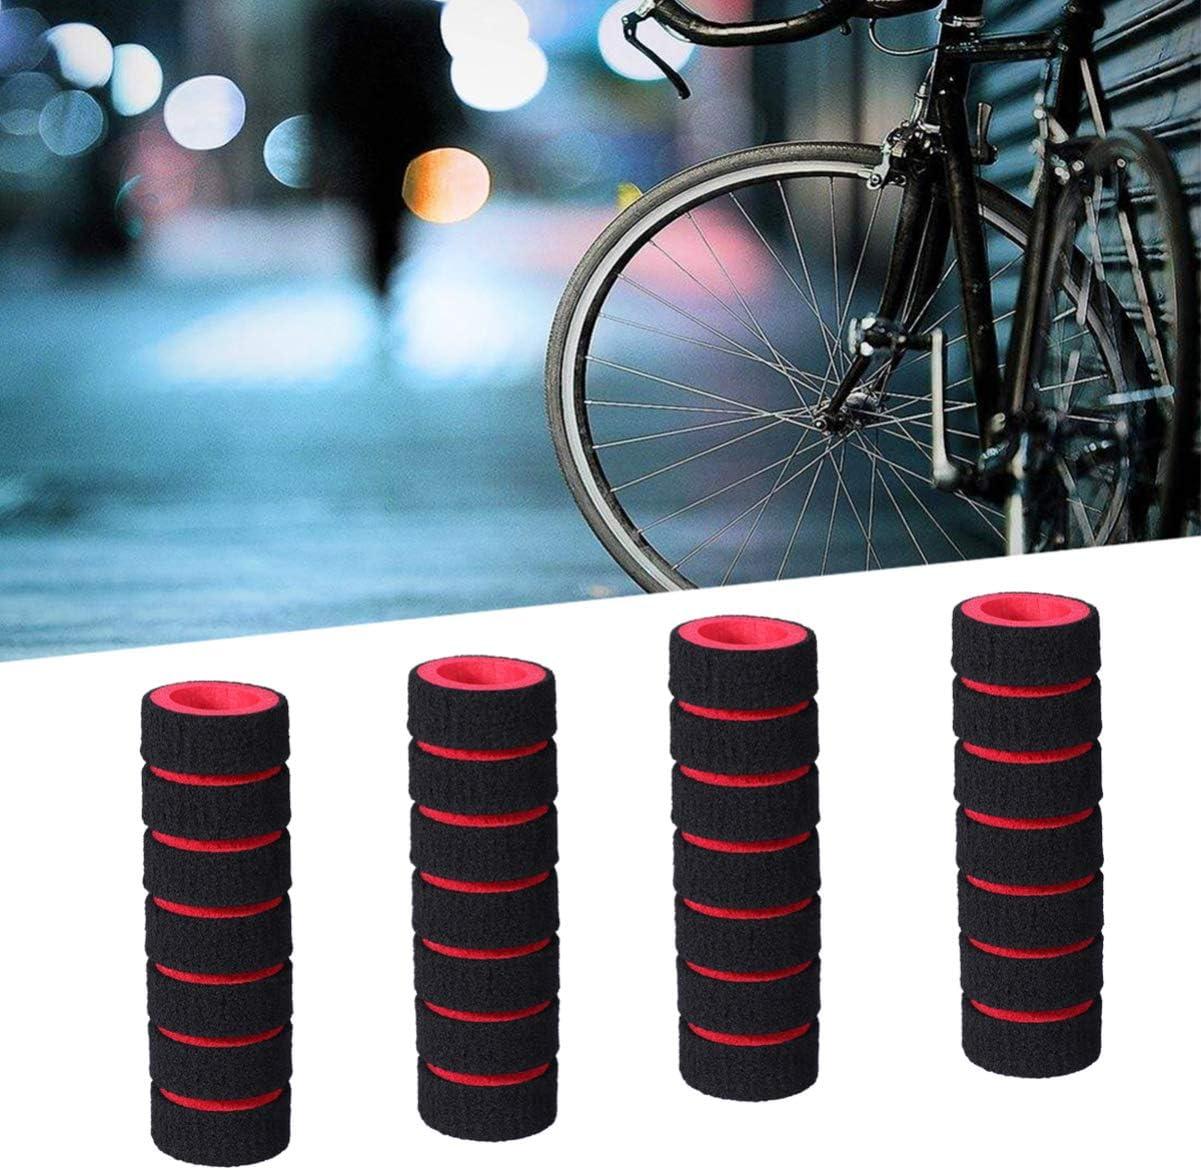 LIOOBO 2 Pares de manubrios con manubrio Mangos de Espuma Esponja Mangos Antideslizantes para Bicicleta de Carreras Bicicleta Motocicleta Rojo